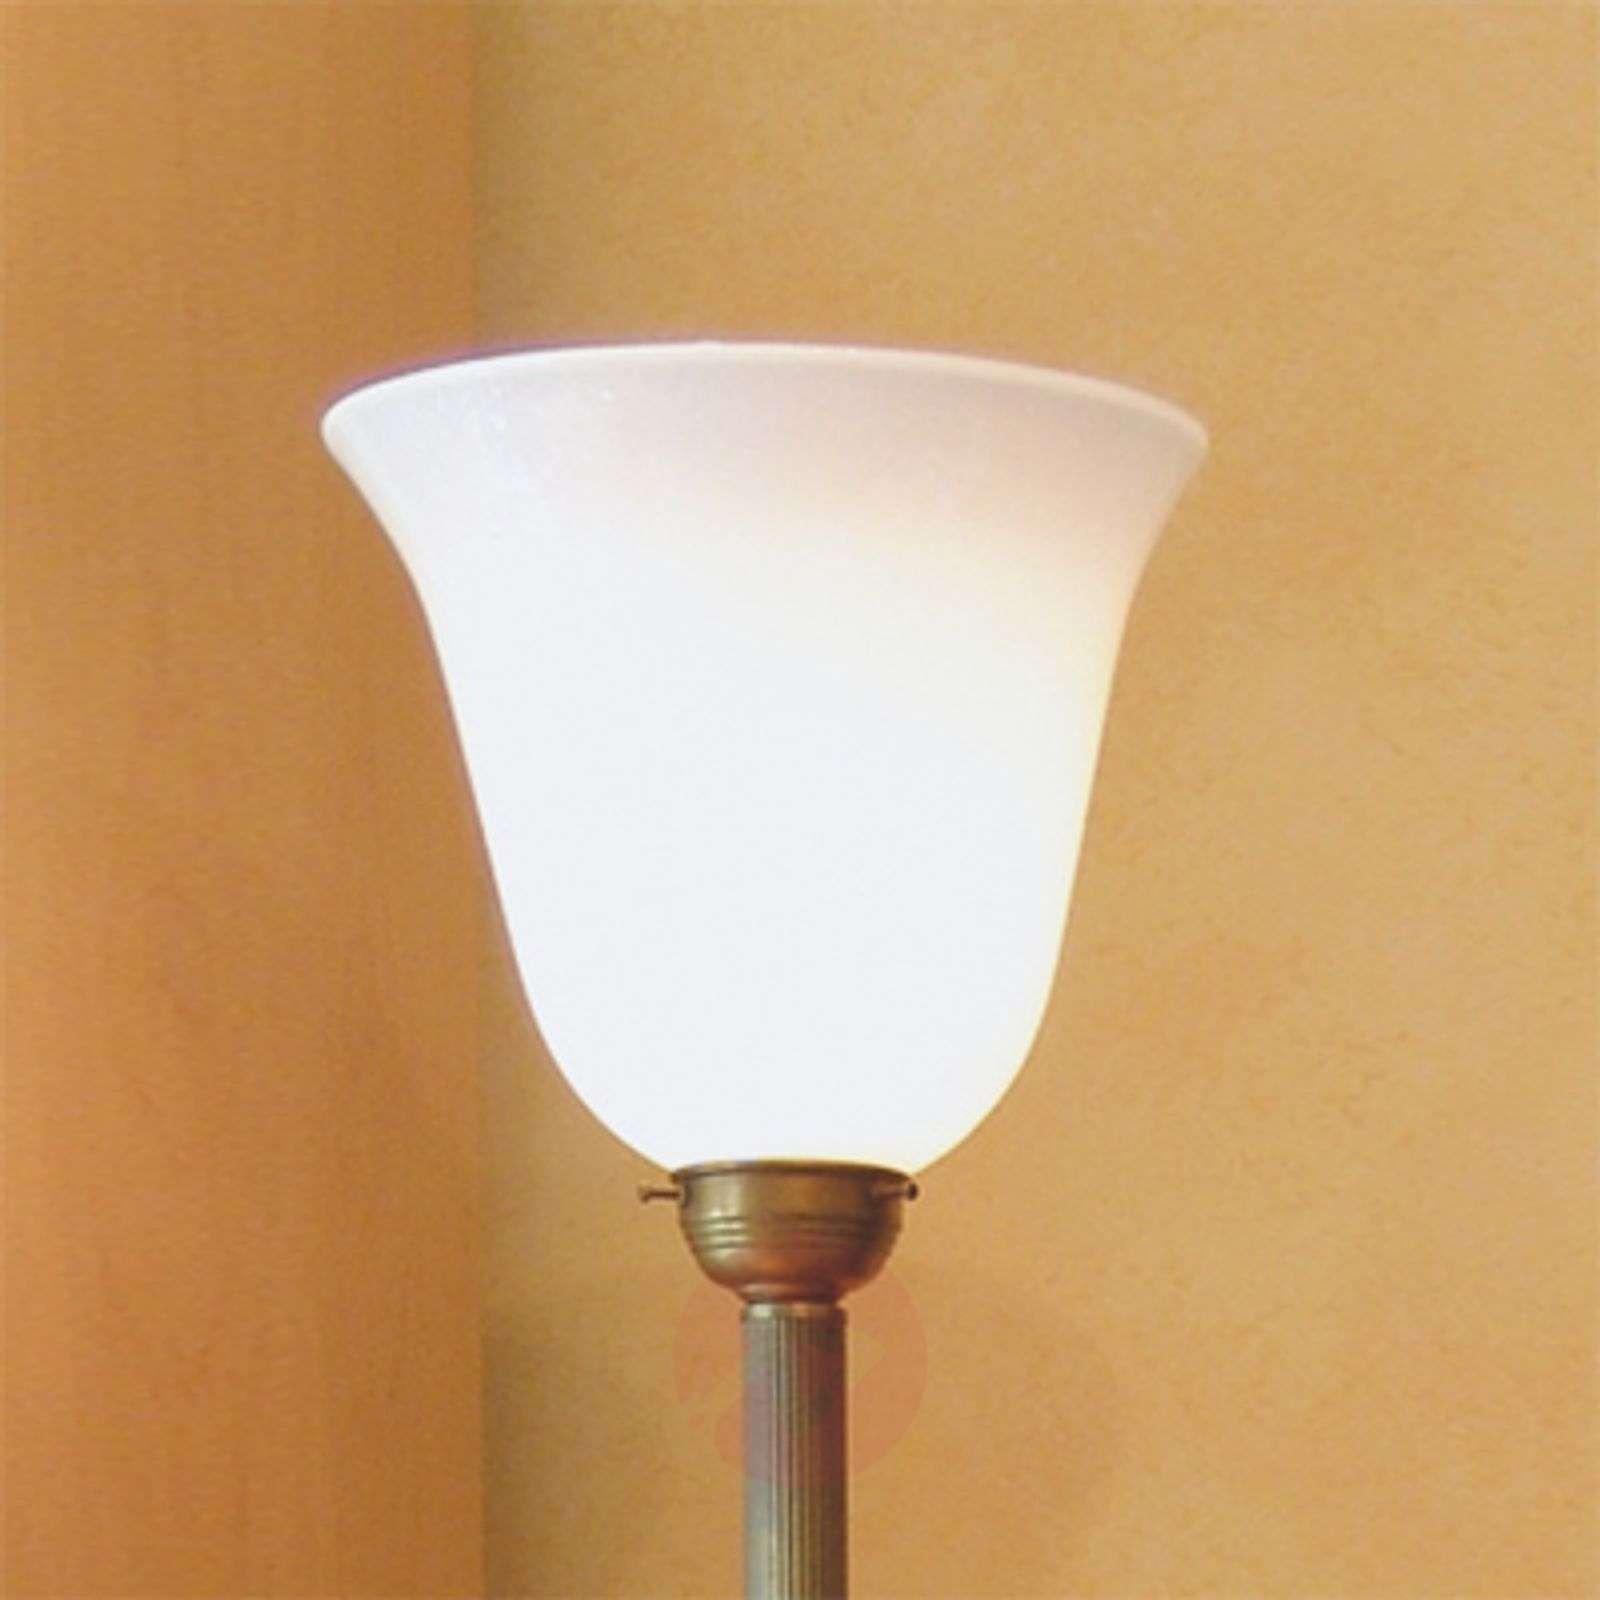 HENRIETTE antique floor lamp-1542011-01